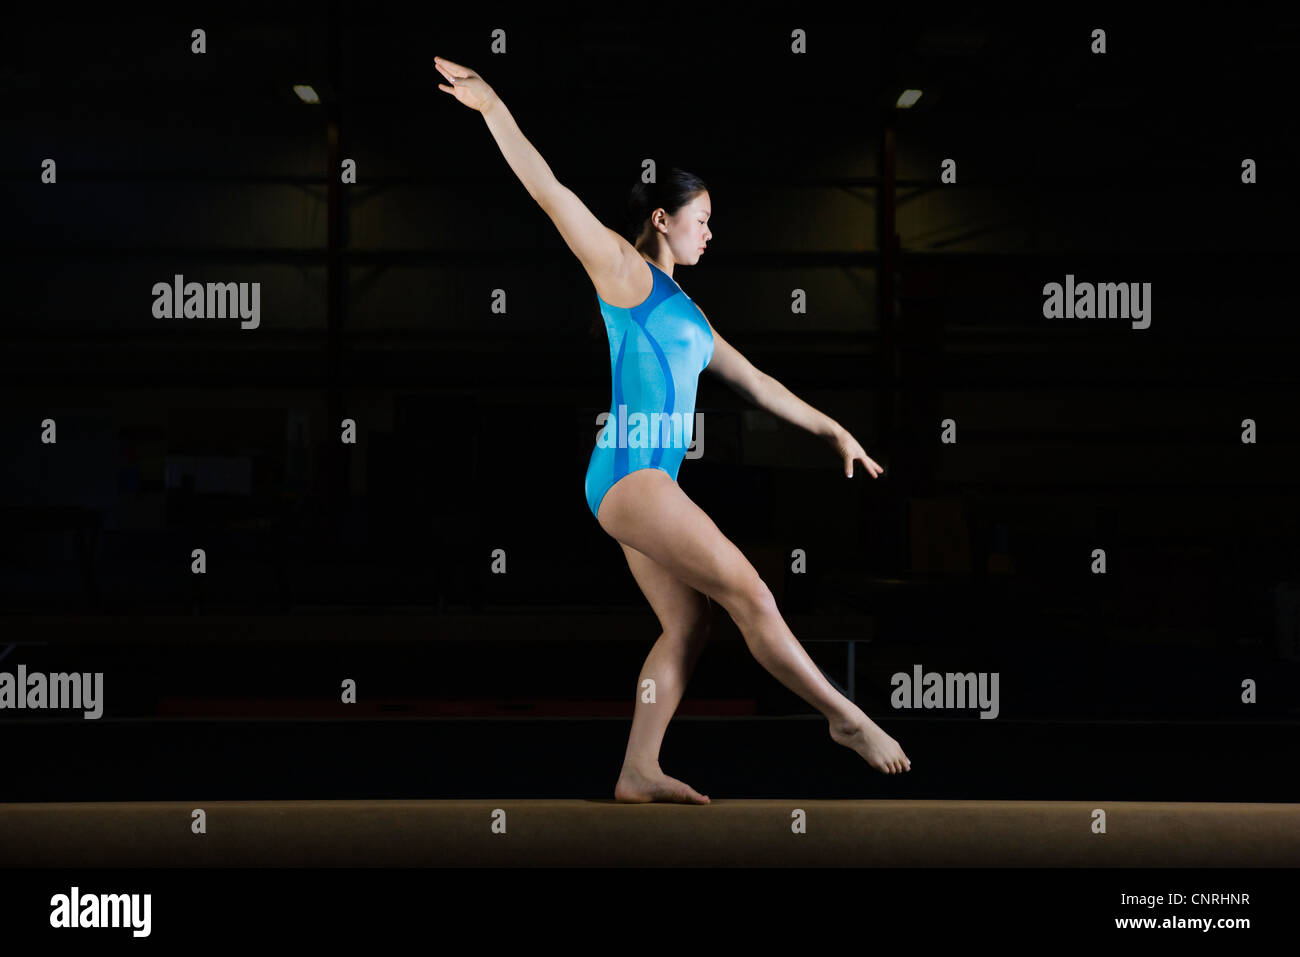 Teenage girl gymnast performing on balance beam - Stock Image